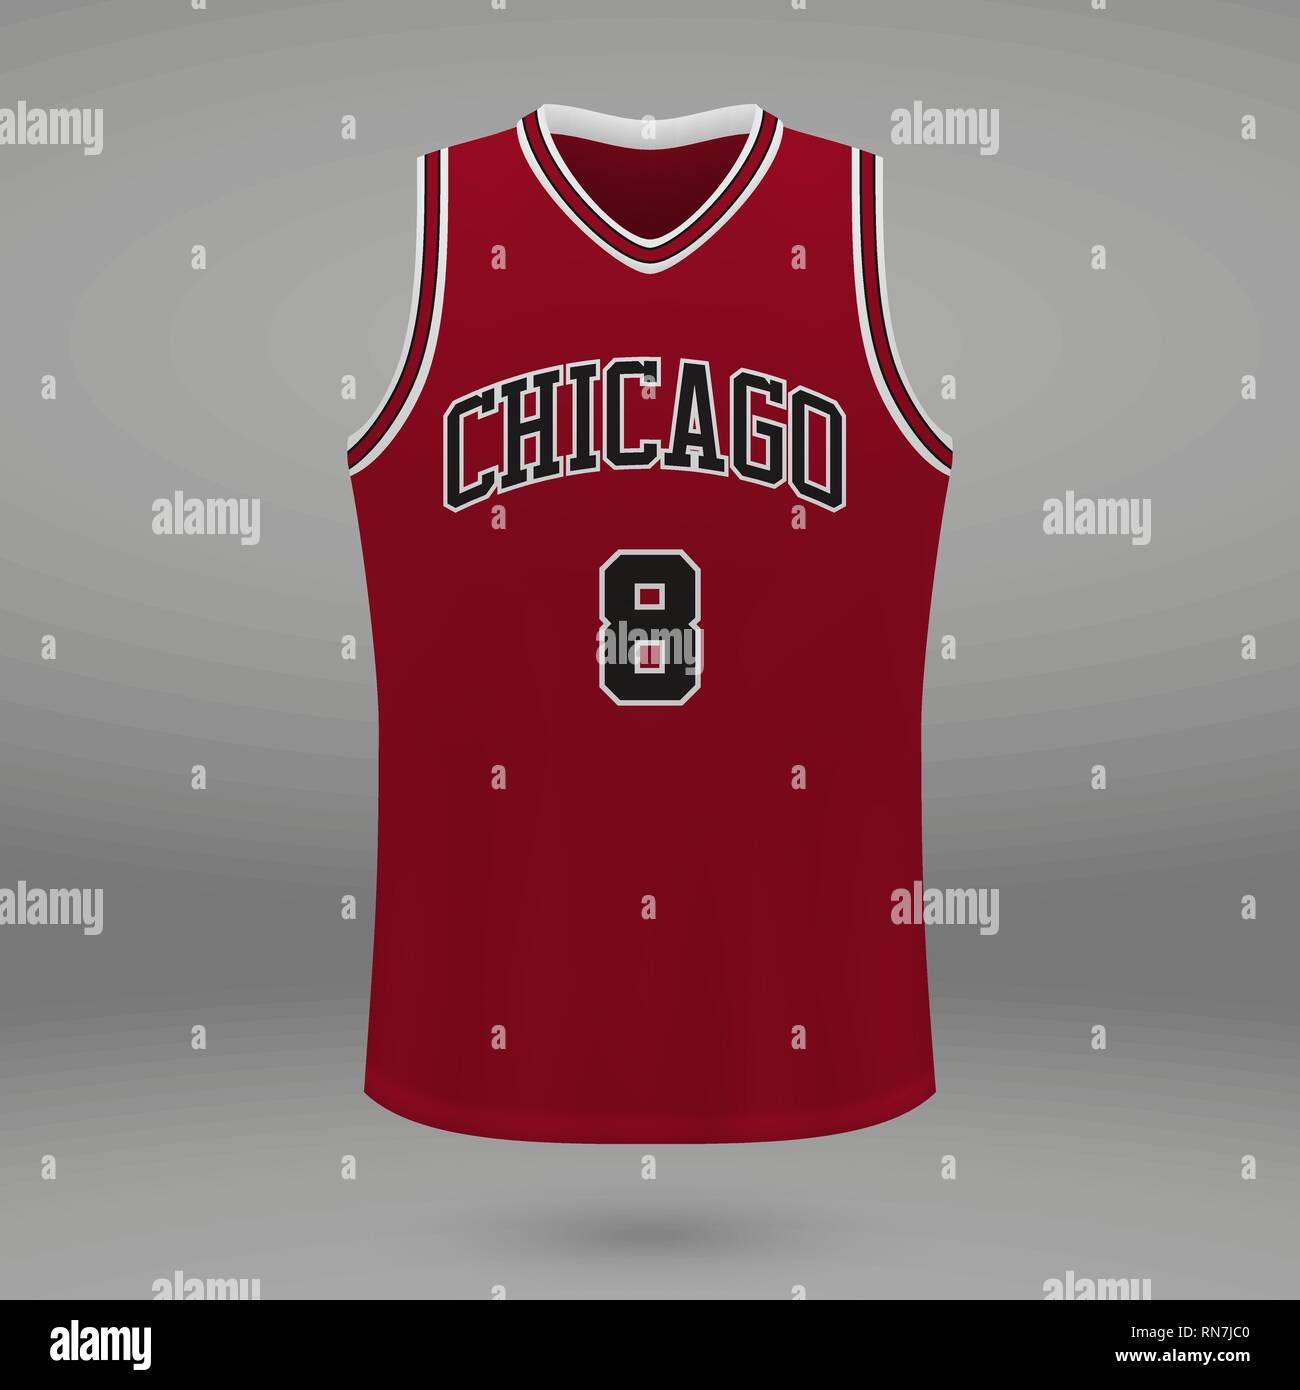 huge discount b092e 350c3 Realistic sport shirt Chicago Bulls, jersey template for ...